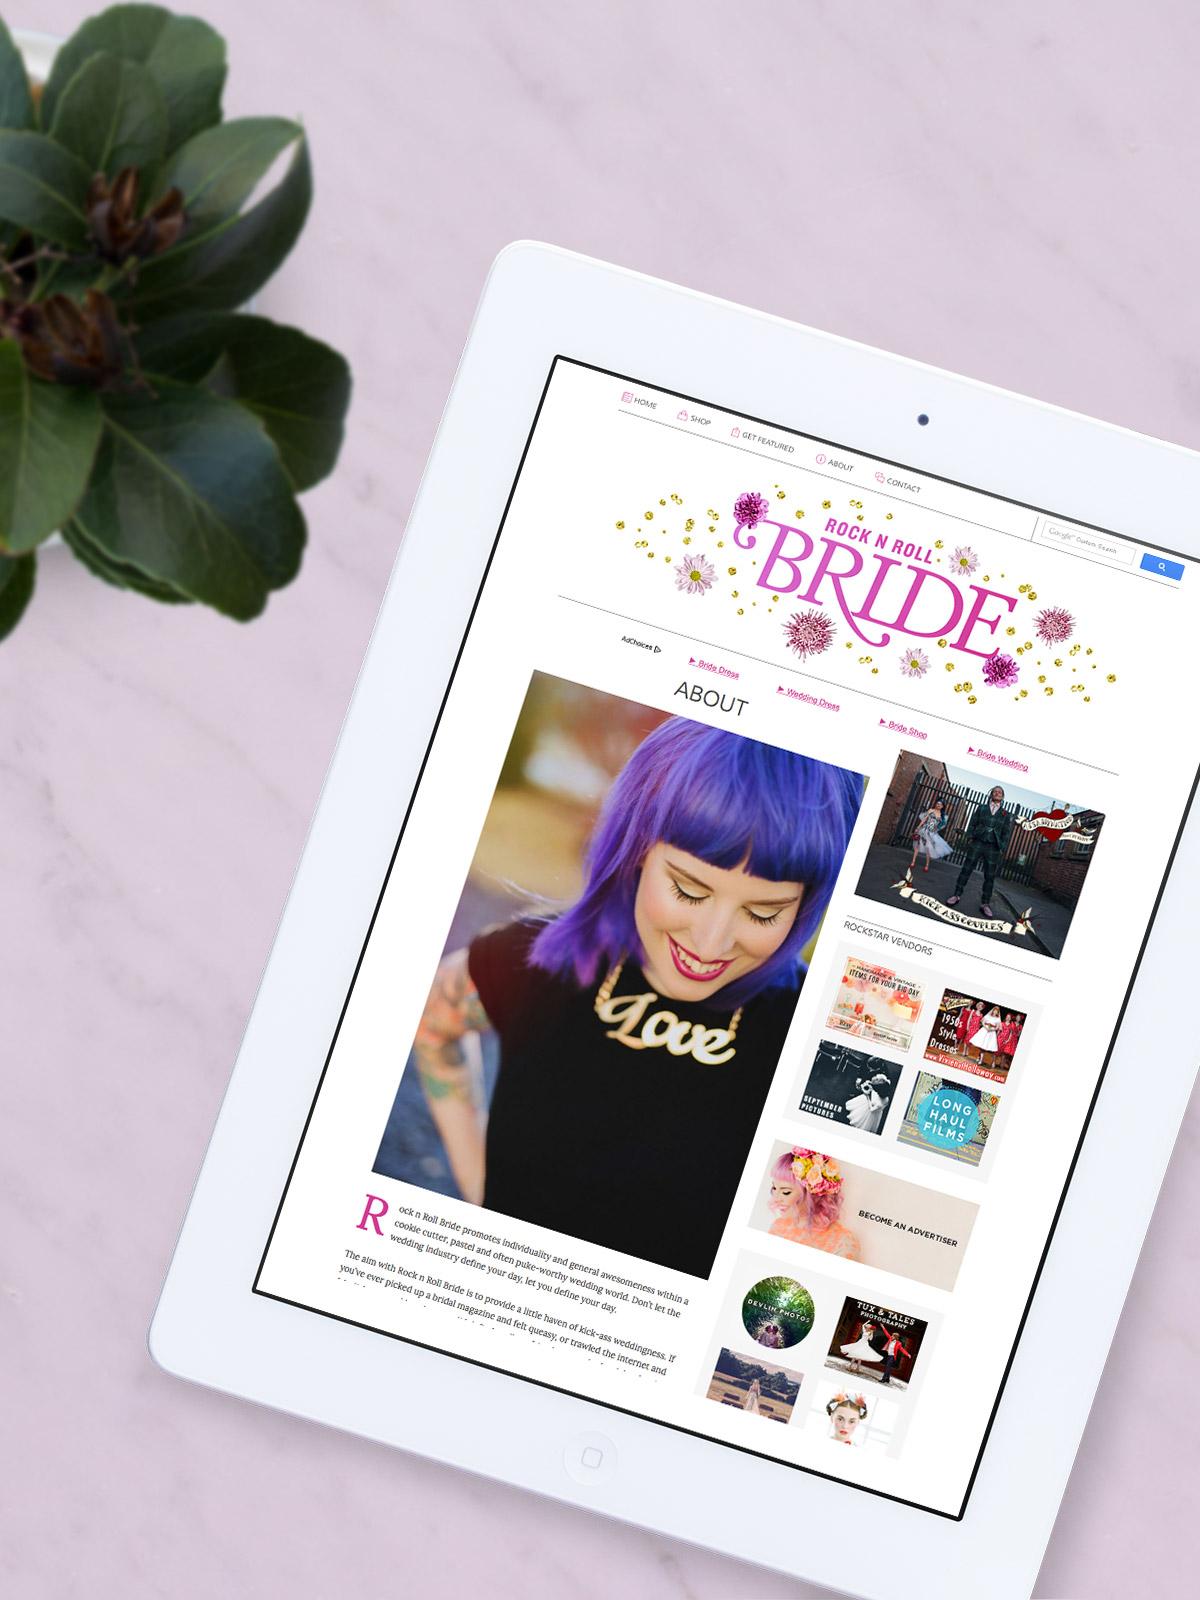 Nubby Twiglet | The New Look of Rock n Roll Bride